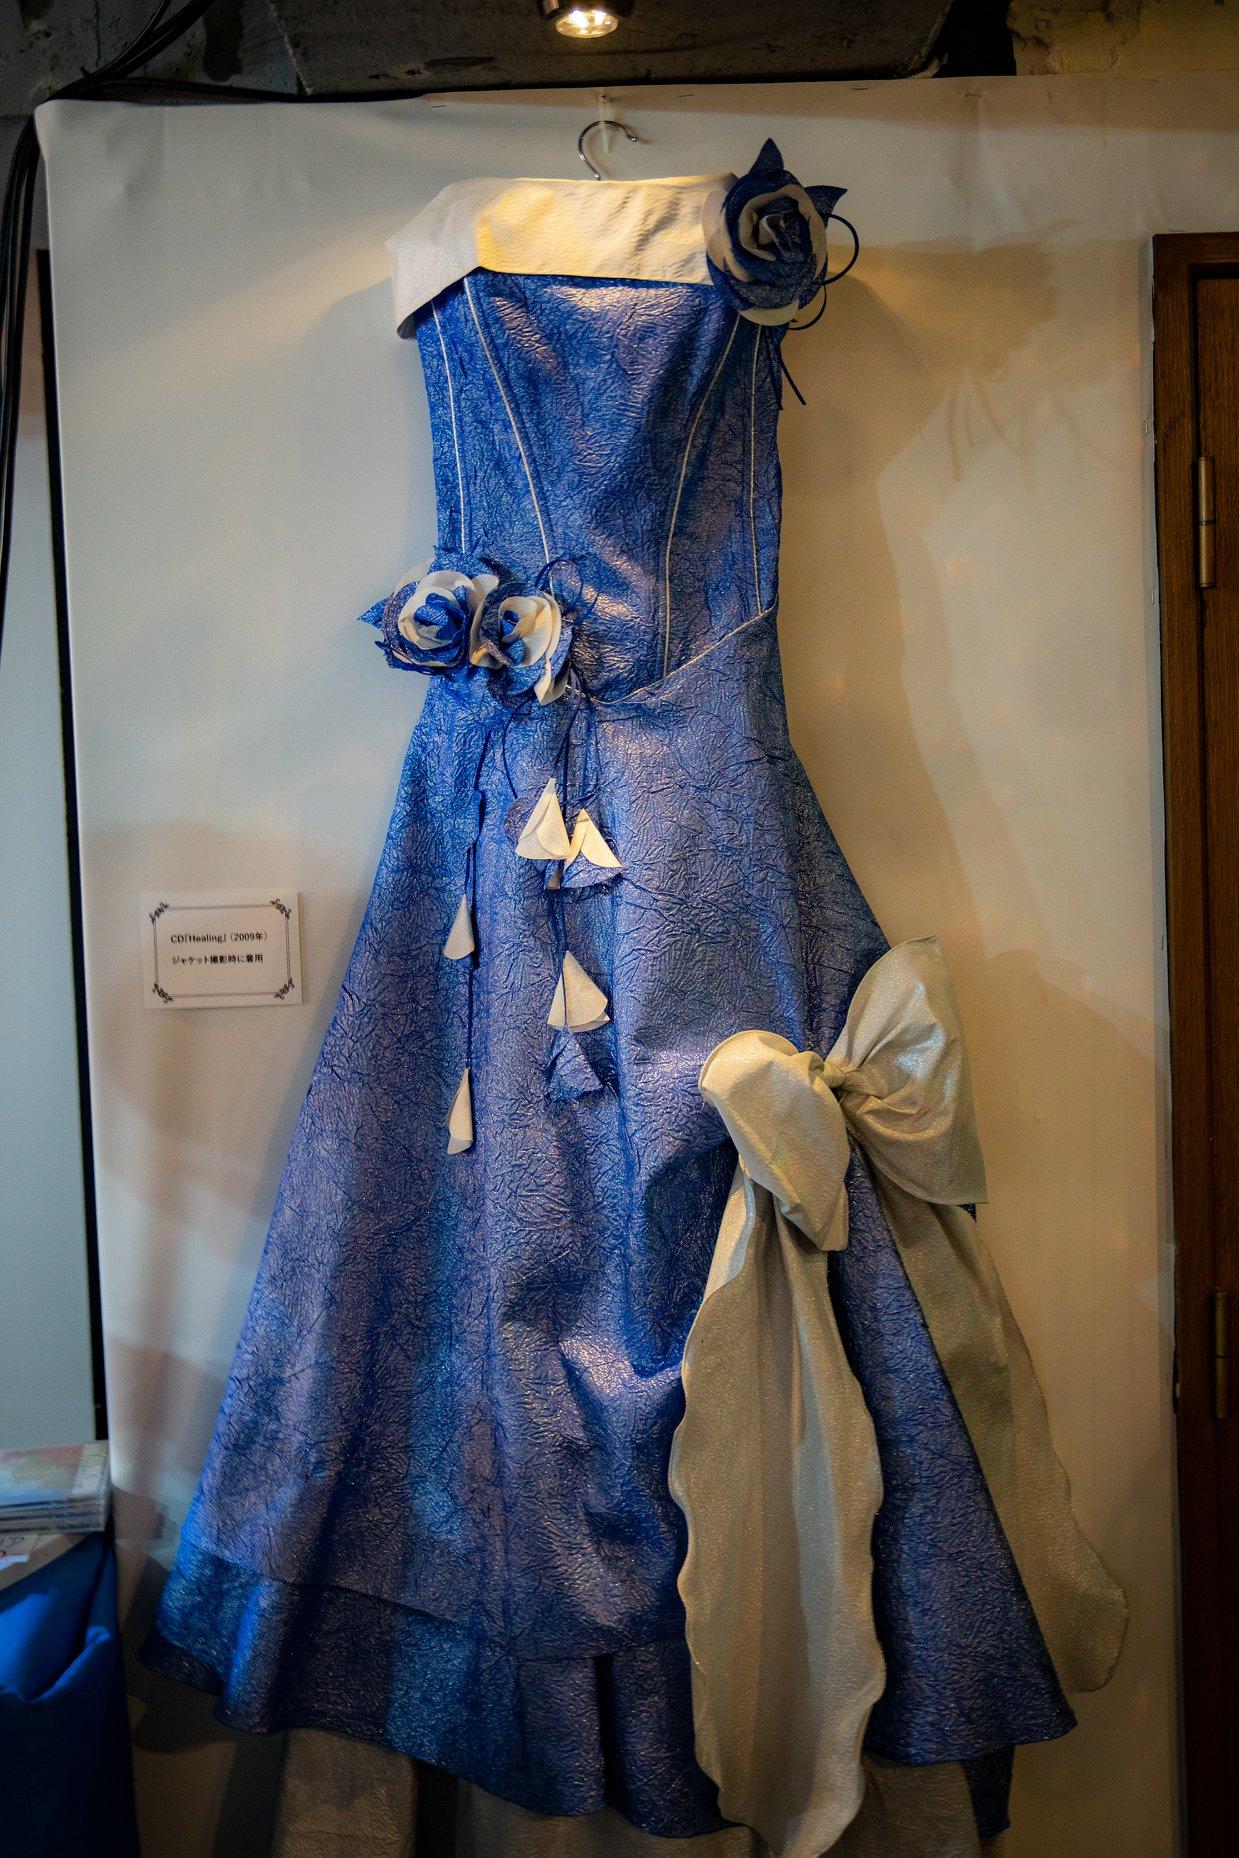 CD『Healing』ジャケット撮影時に着用のドレス